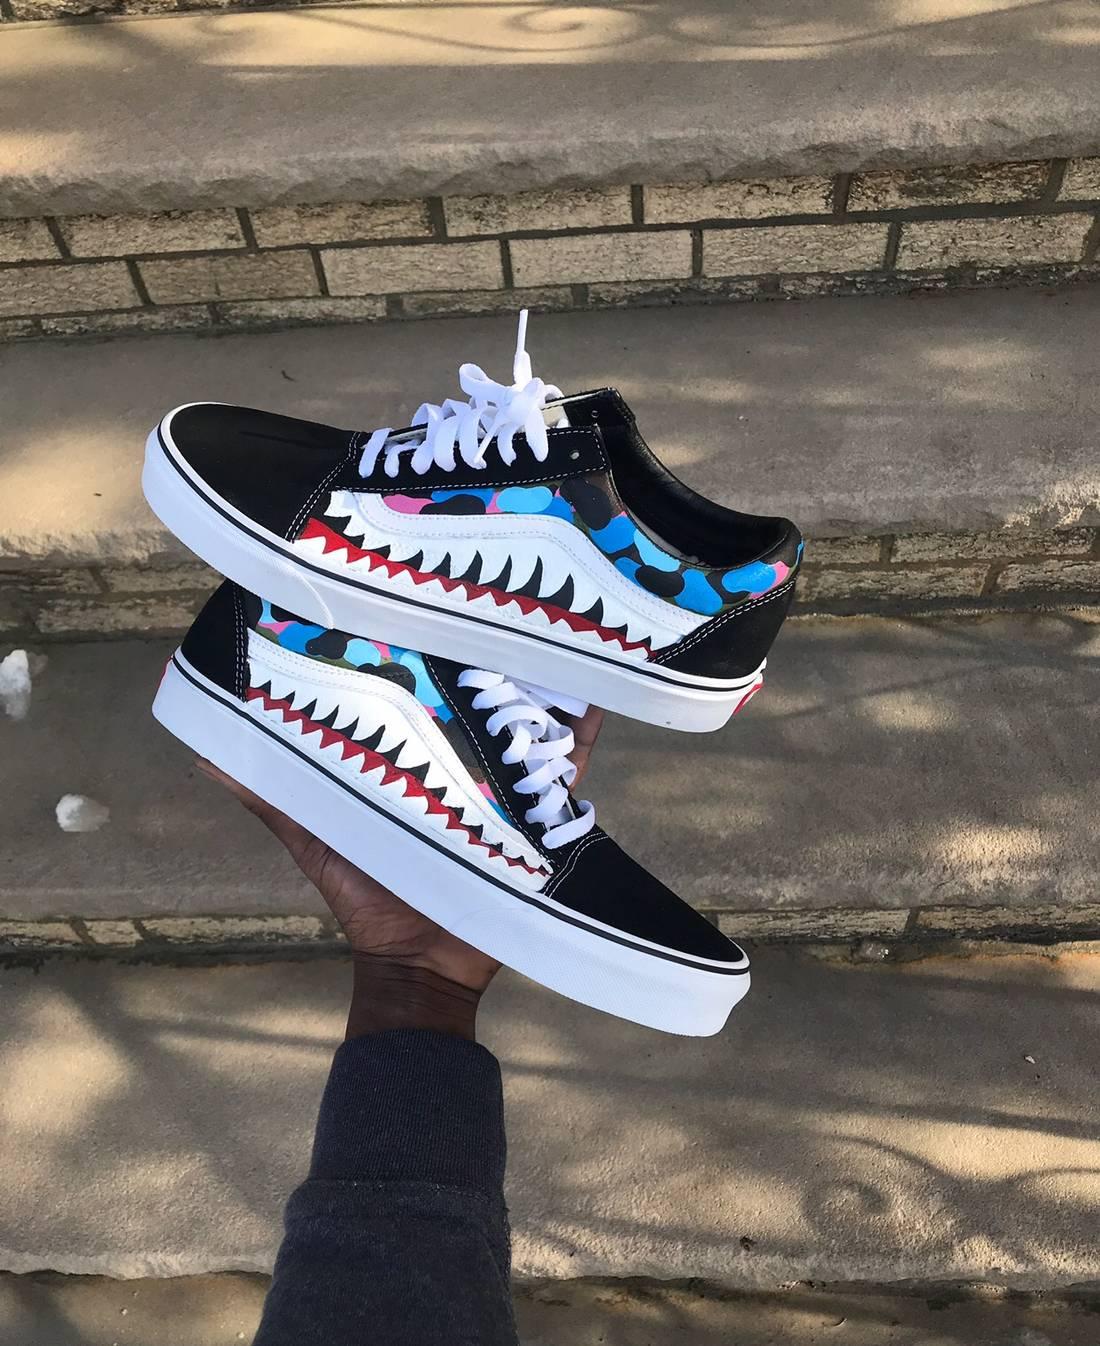 Vans Custom Inspired Bape Shark Teeth Customized Size US 10 EU 43